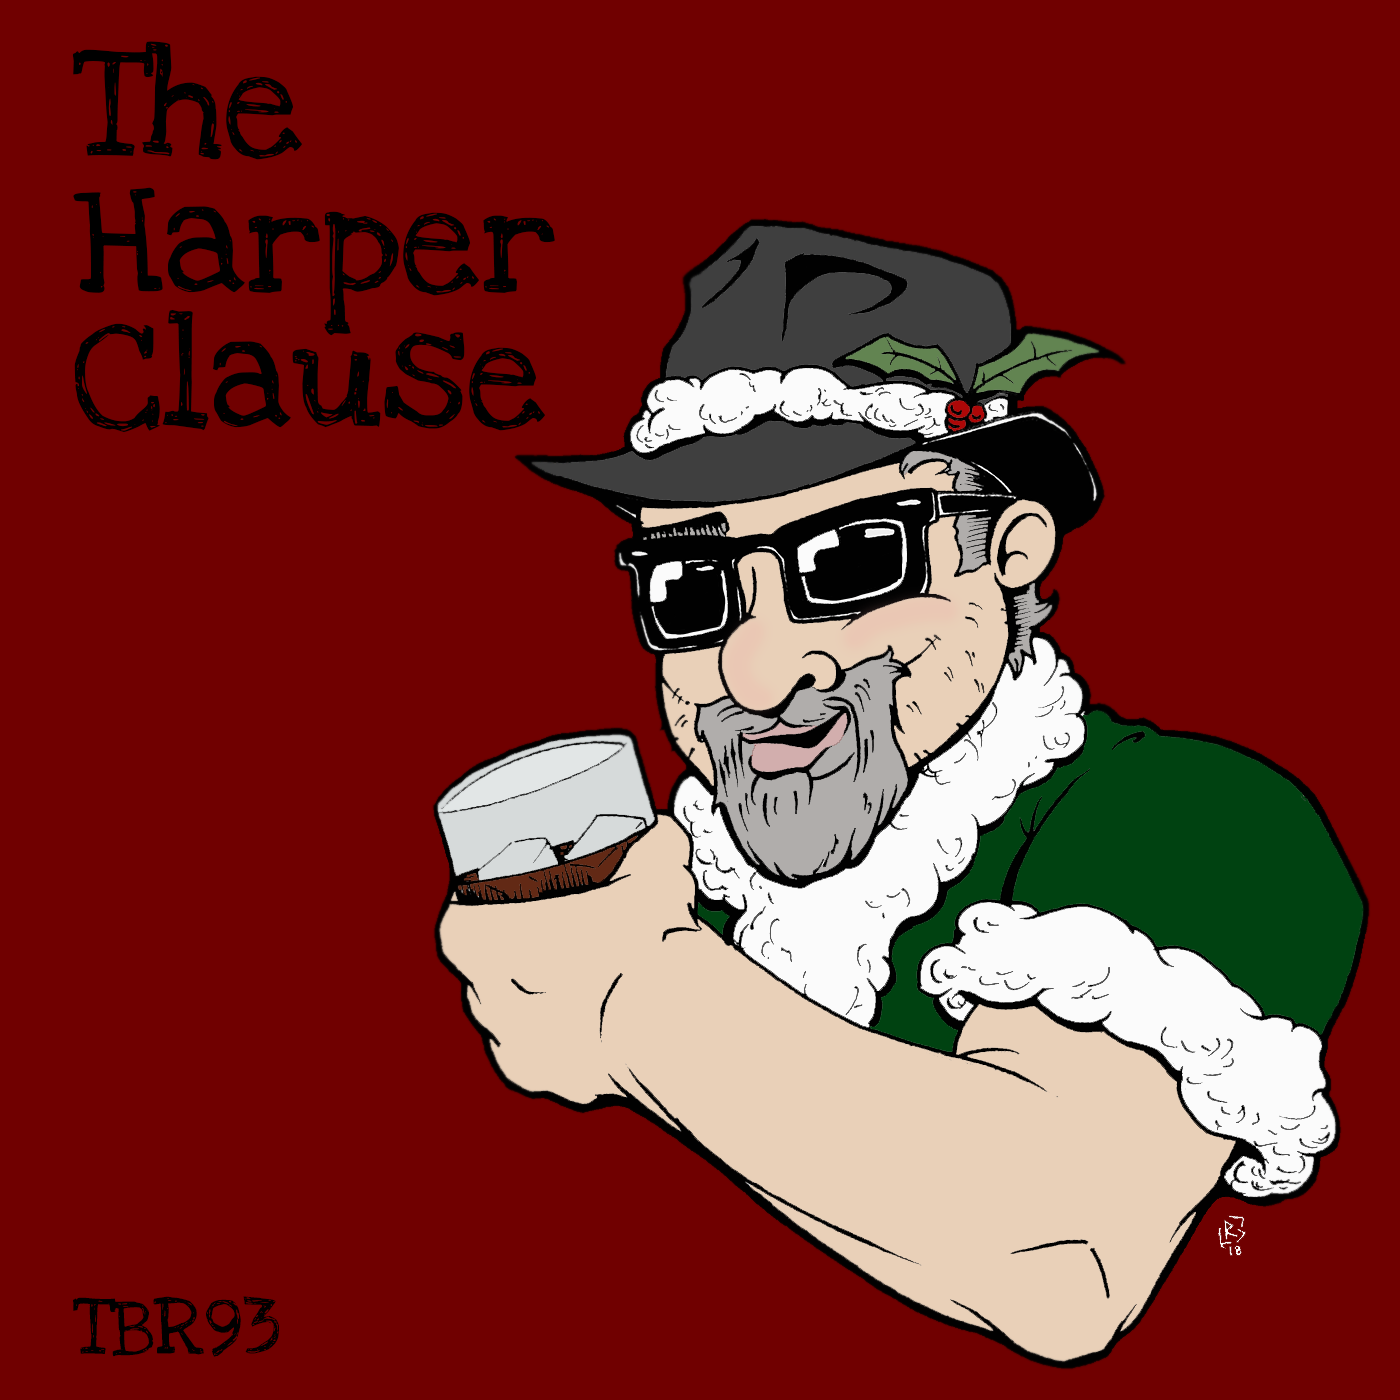 Episode 93 - The Harper Clause